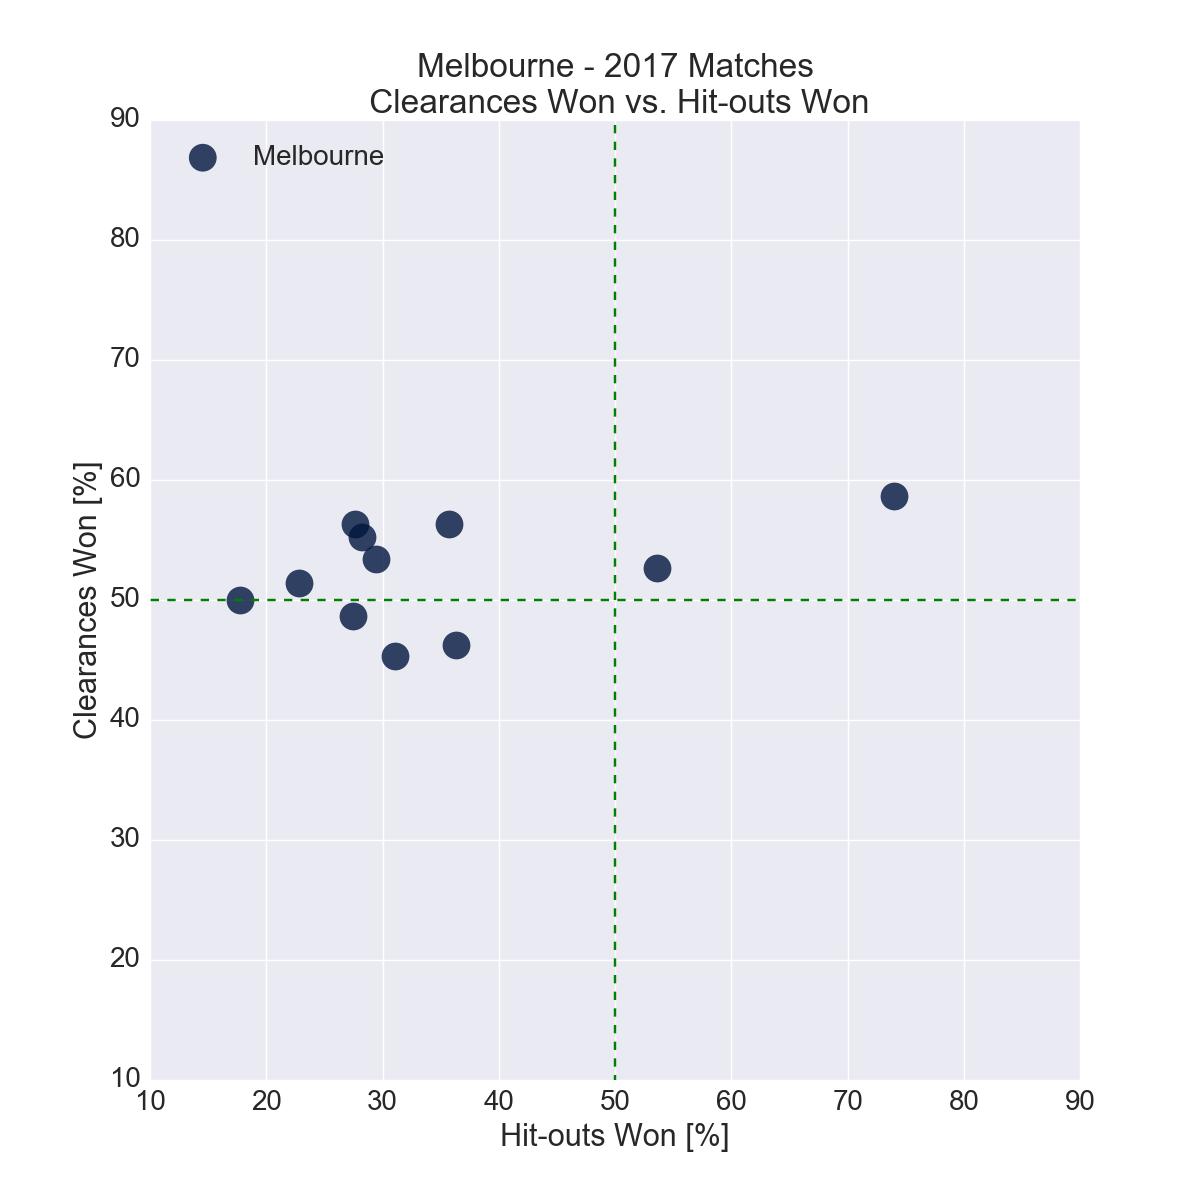 Figure-14: Melbourne in 2017 – Clearances Won vs. Hit-outs Won